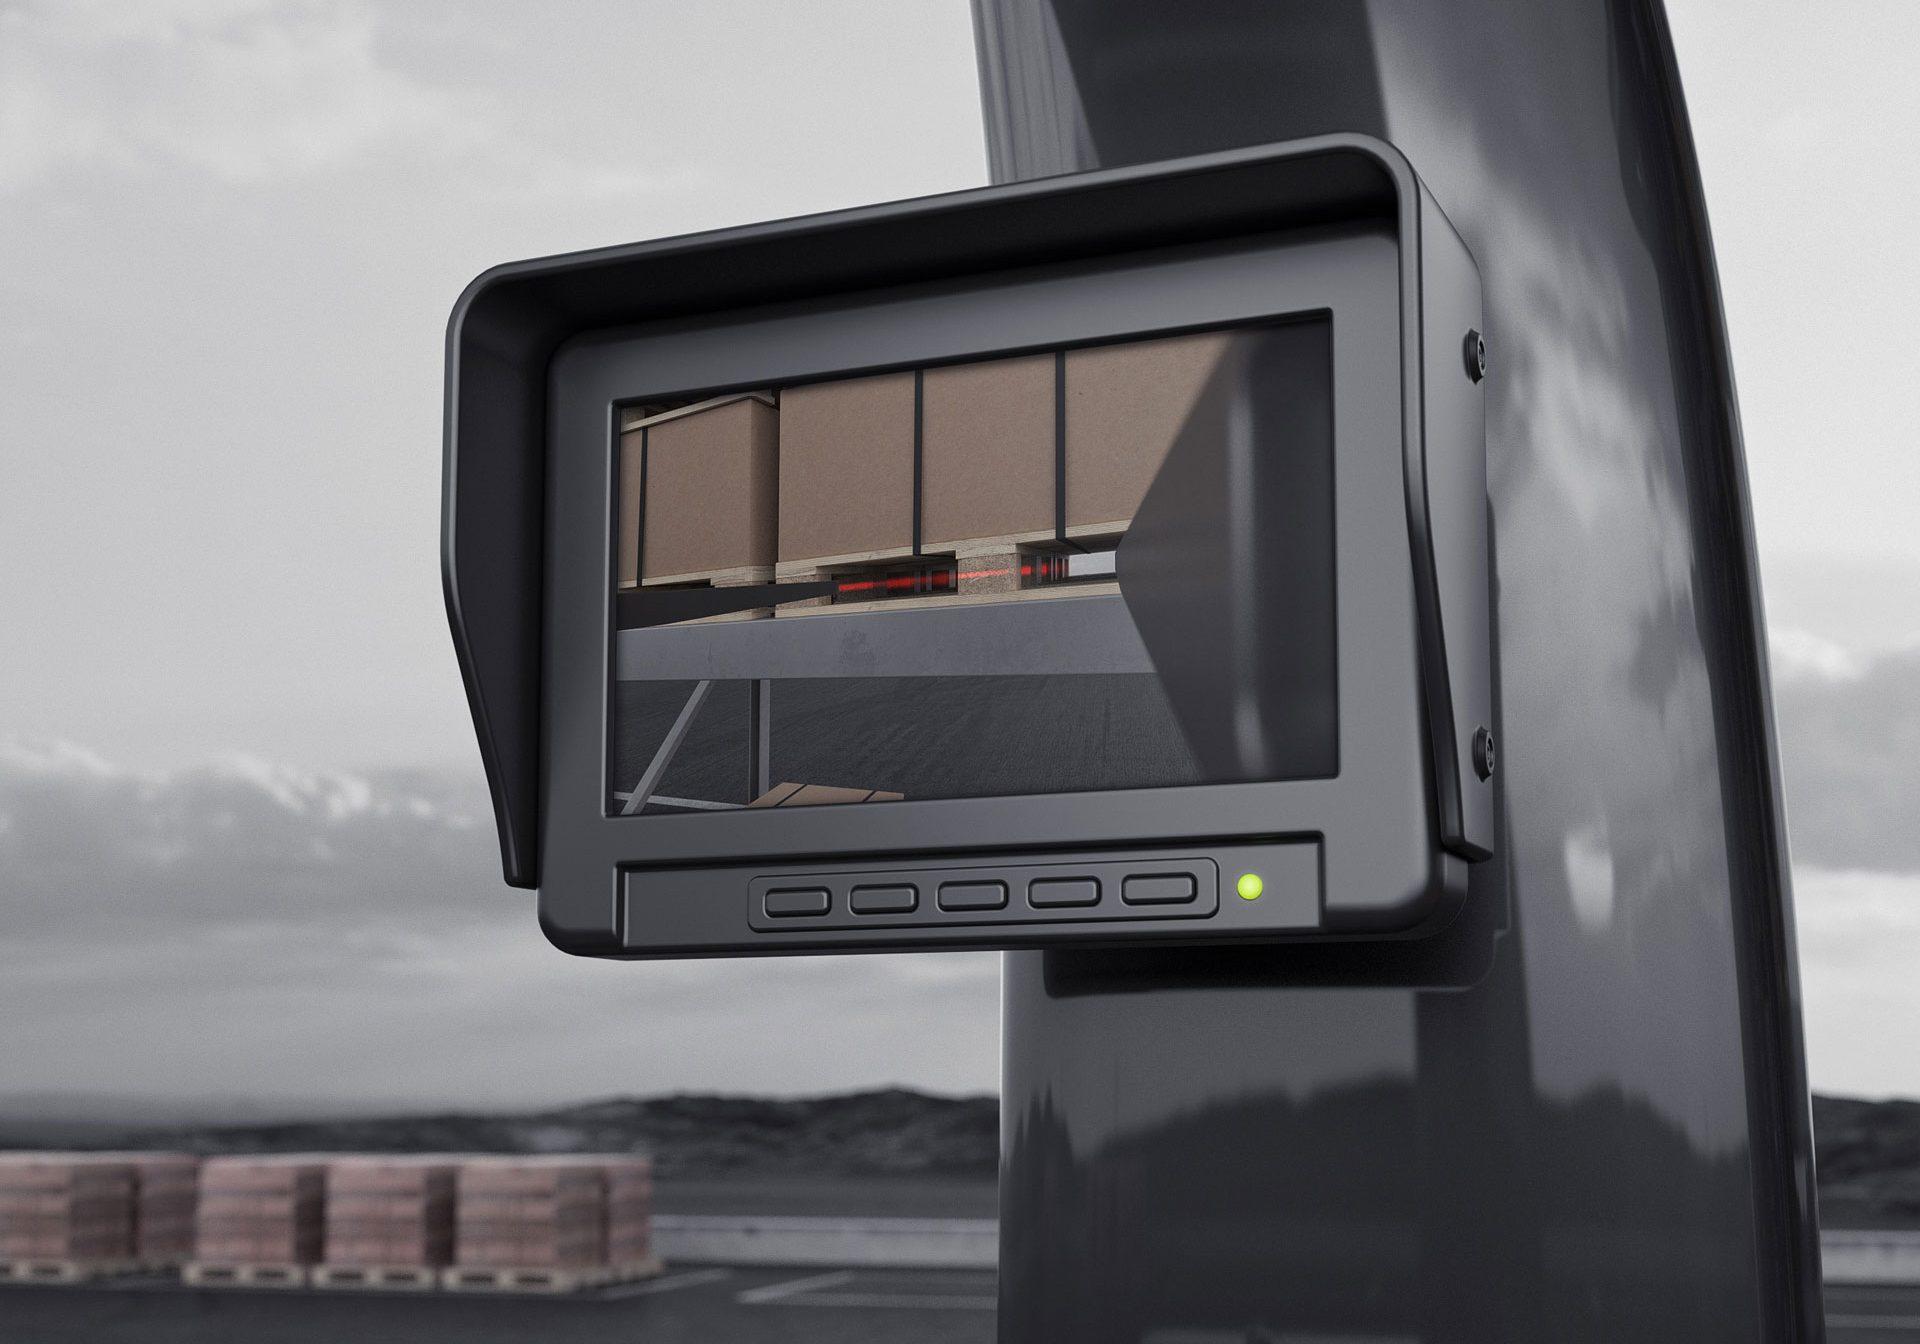 smartfork-sidecam-monitor-hagaberg